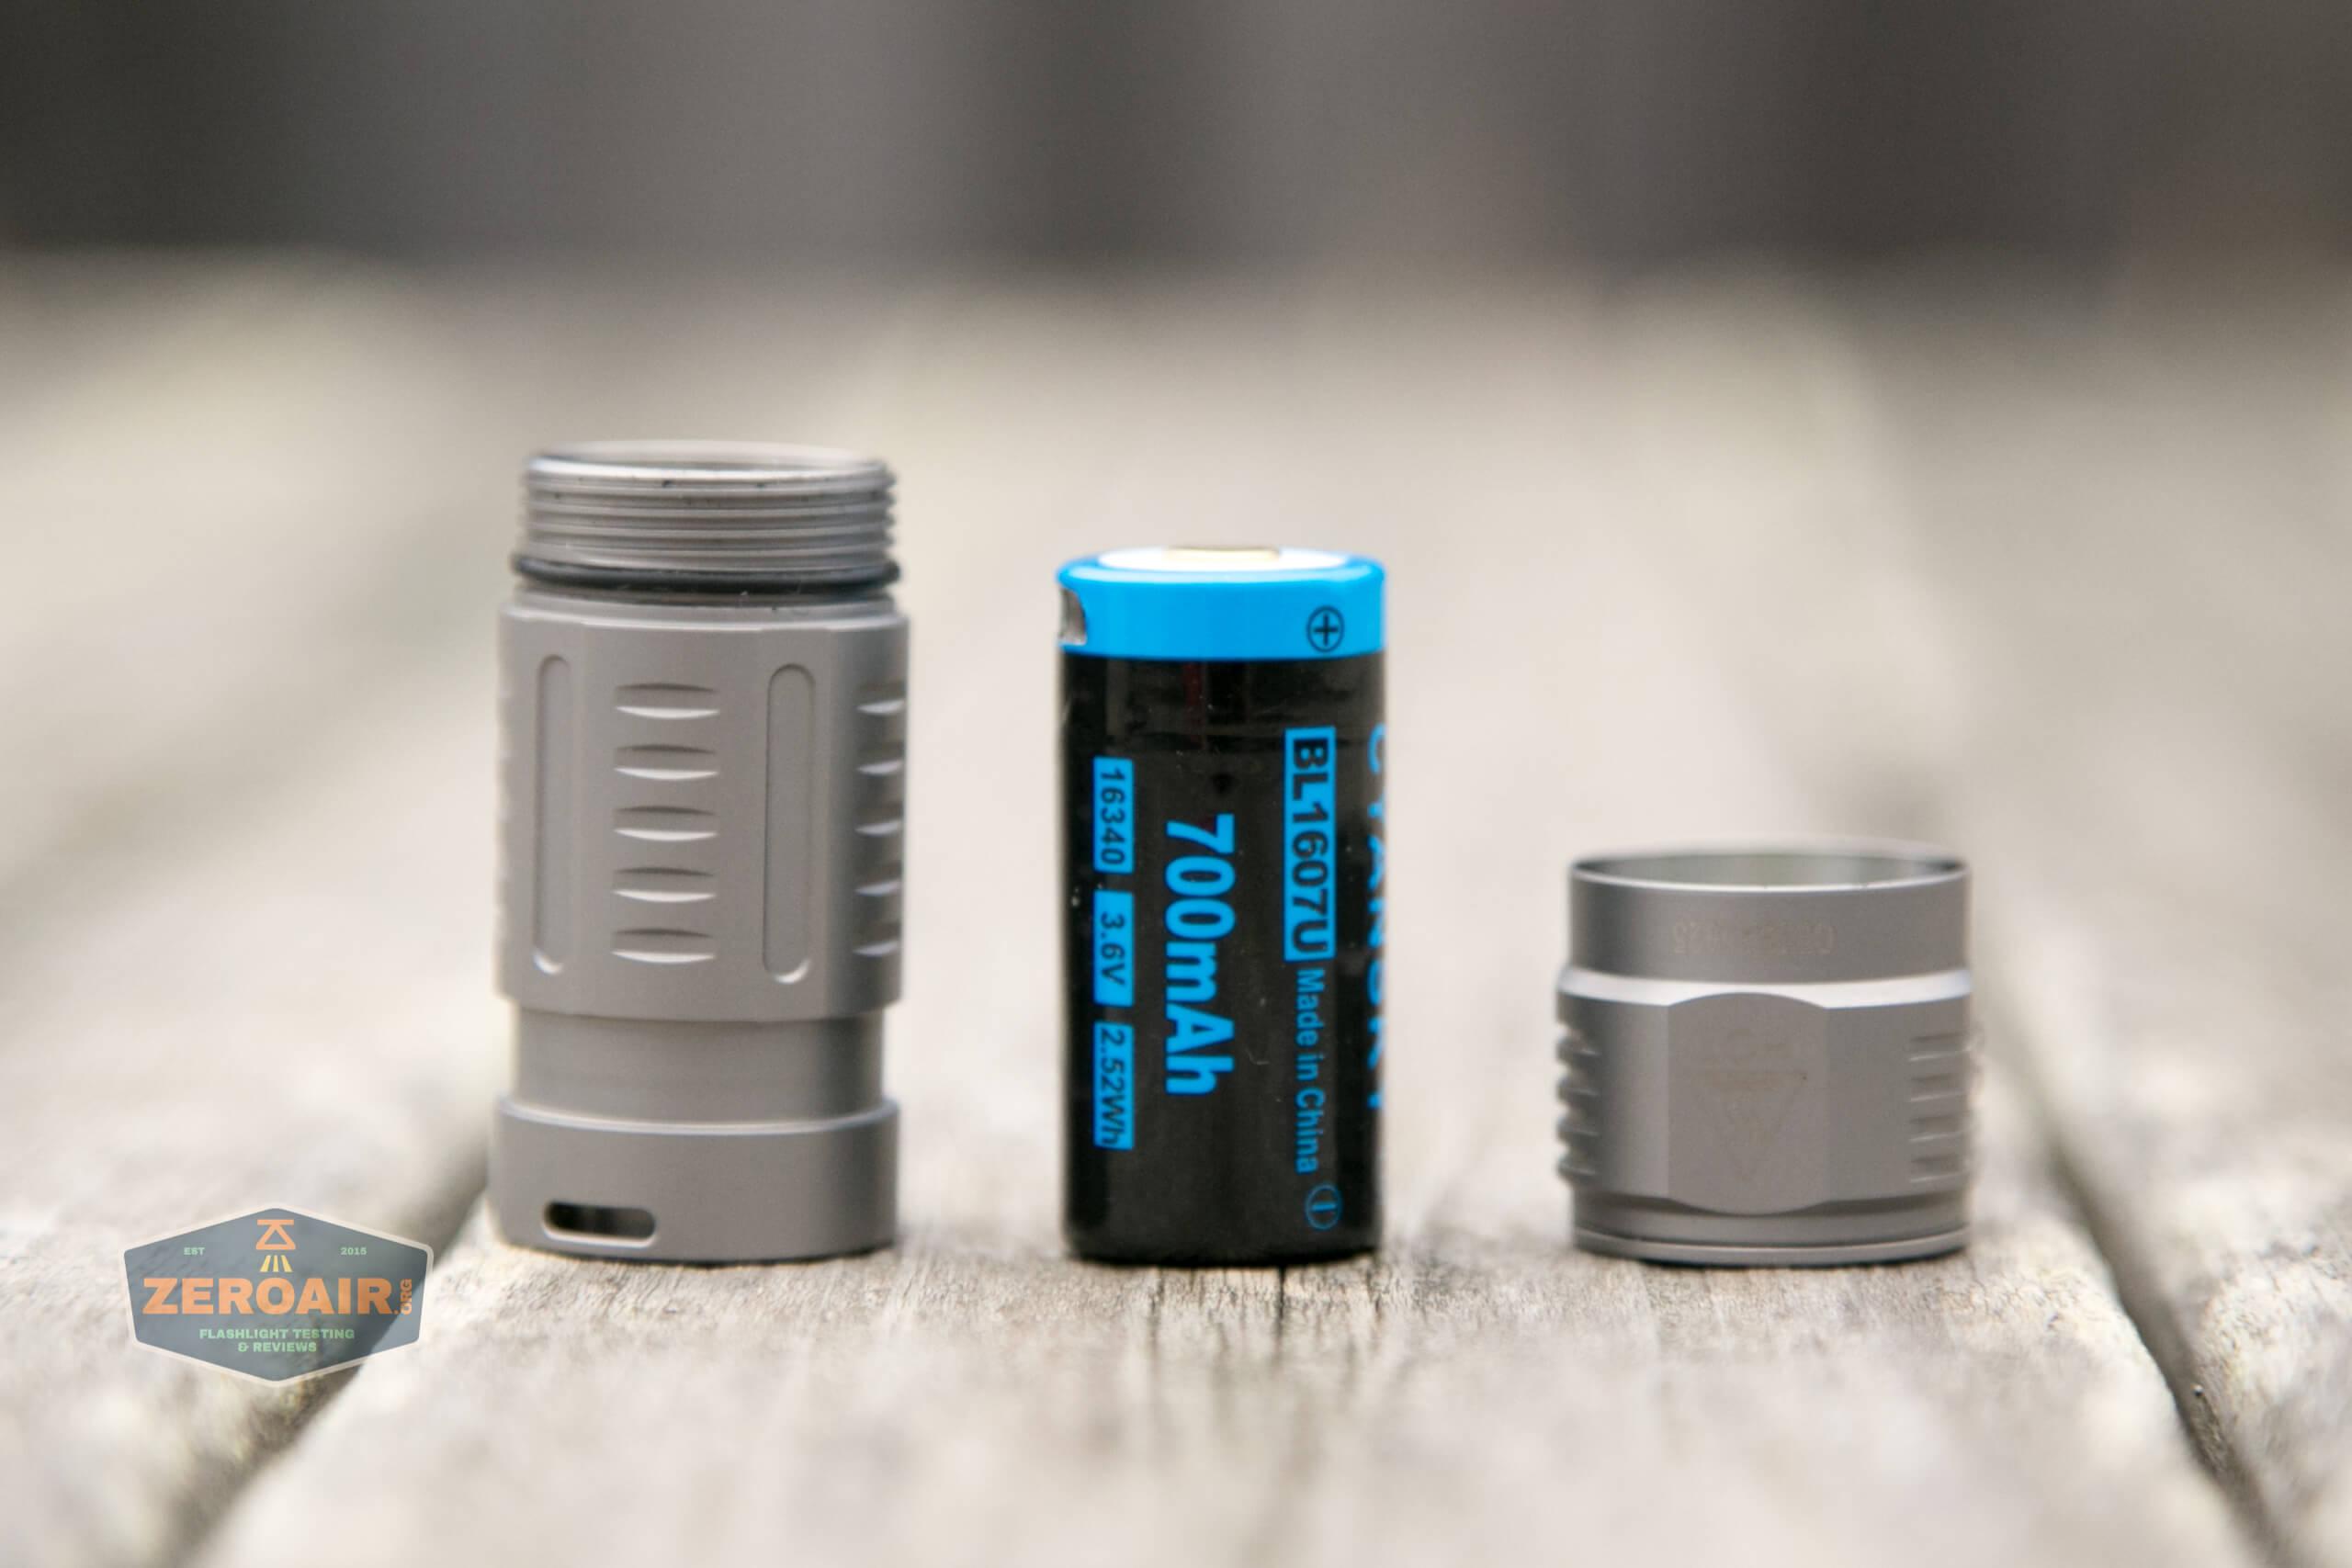 freasygears cyansky m3 titanium pocket flashlight disassembled and cell